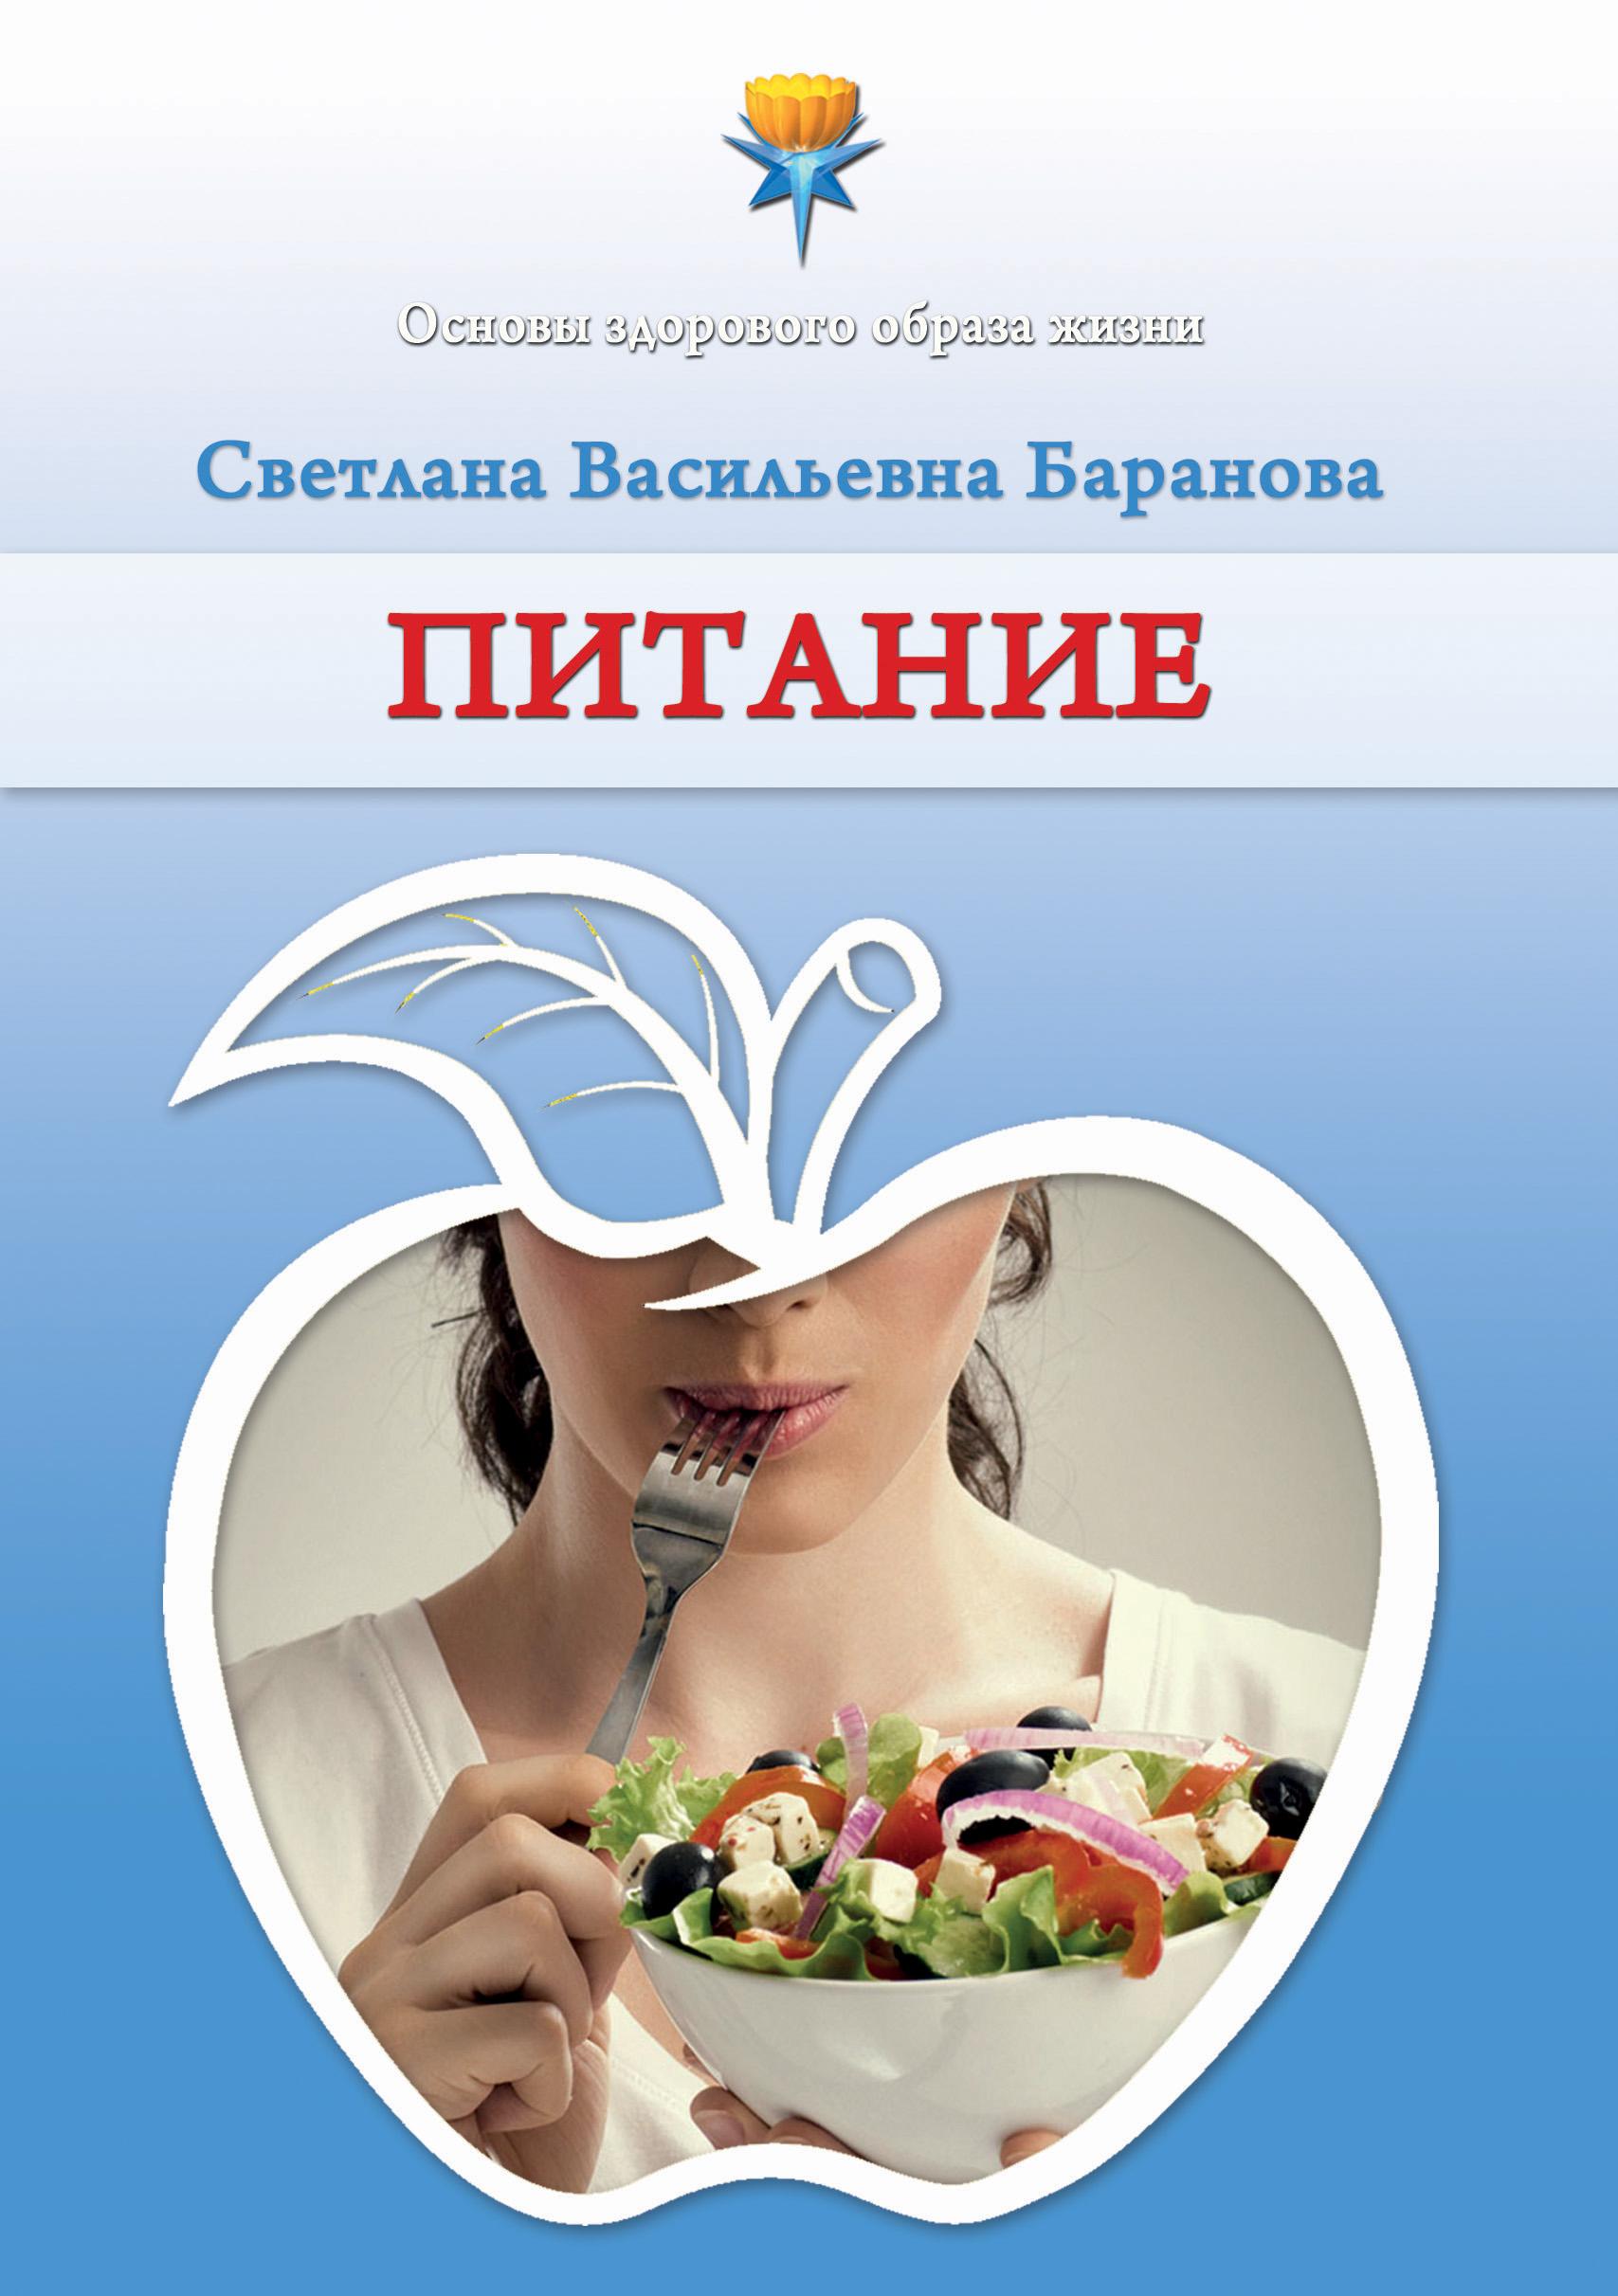 Светлана Васильевна Баранова Питание светлана васильевна баранова этика человека